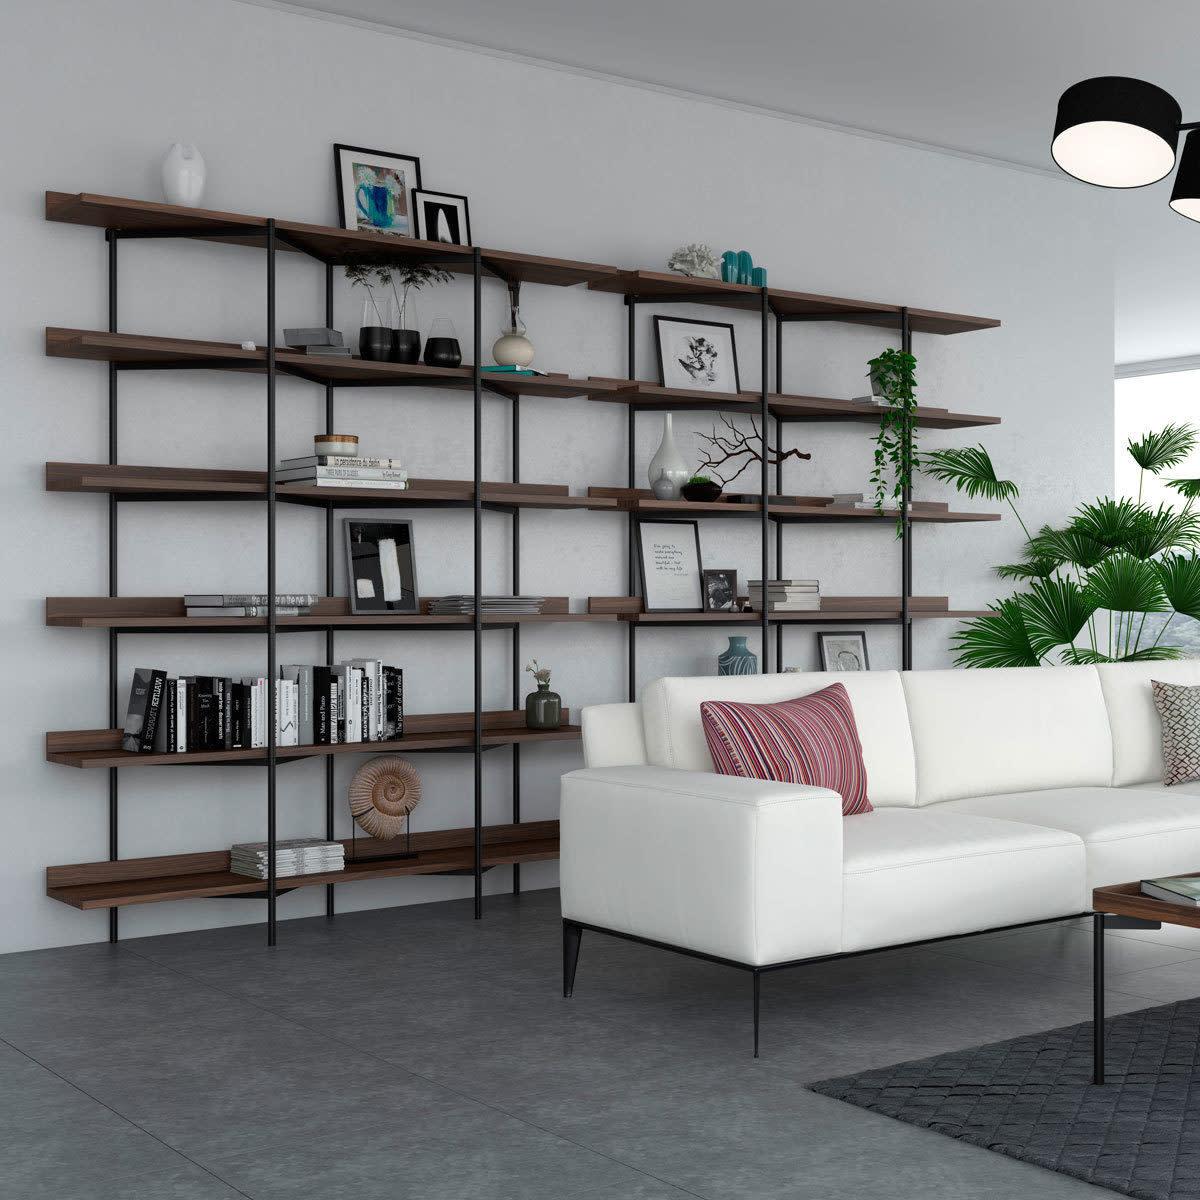 BDI Kite 5306 Six-tier Shelf